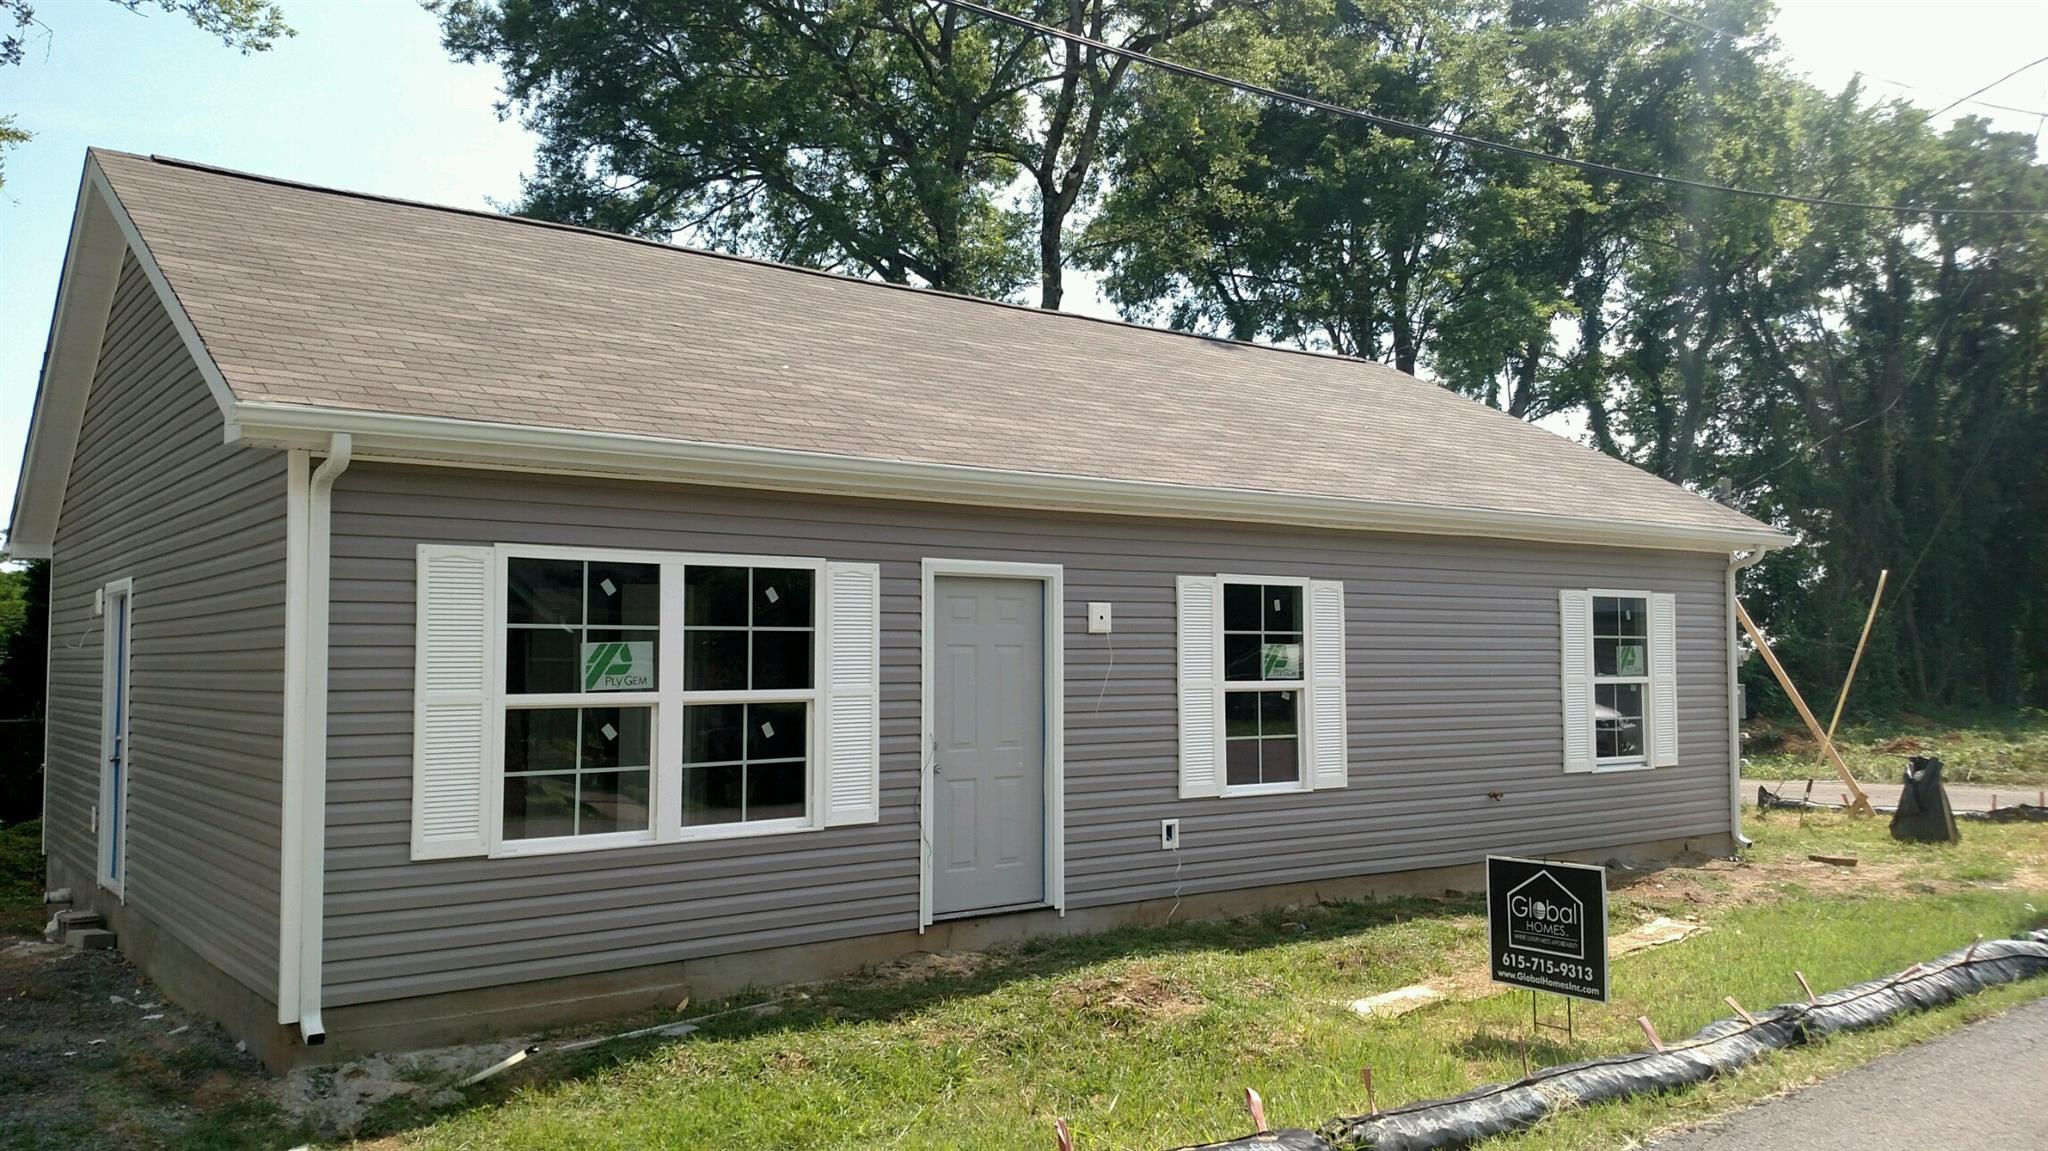 402 Vaughn St, Murfreesboro, TN 37130